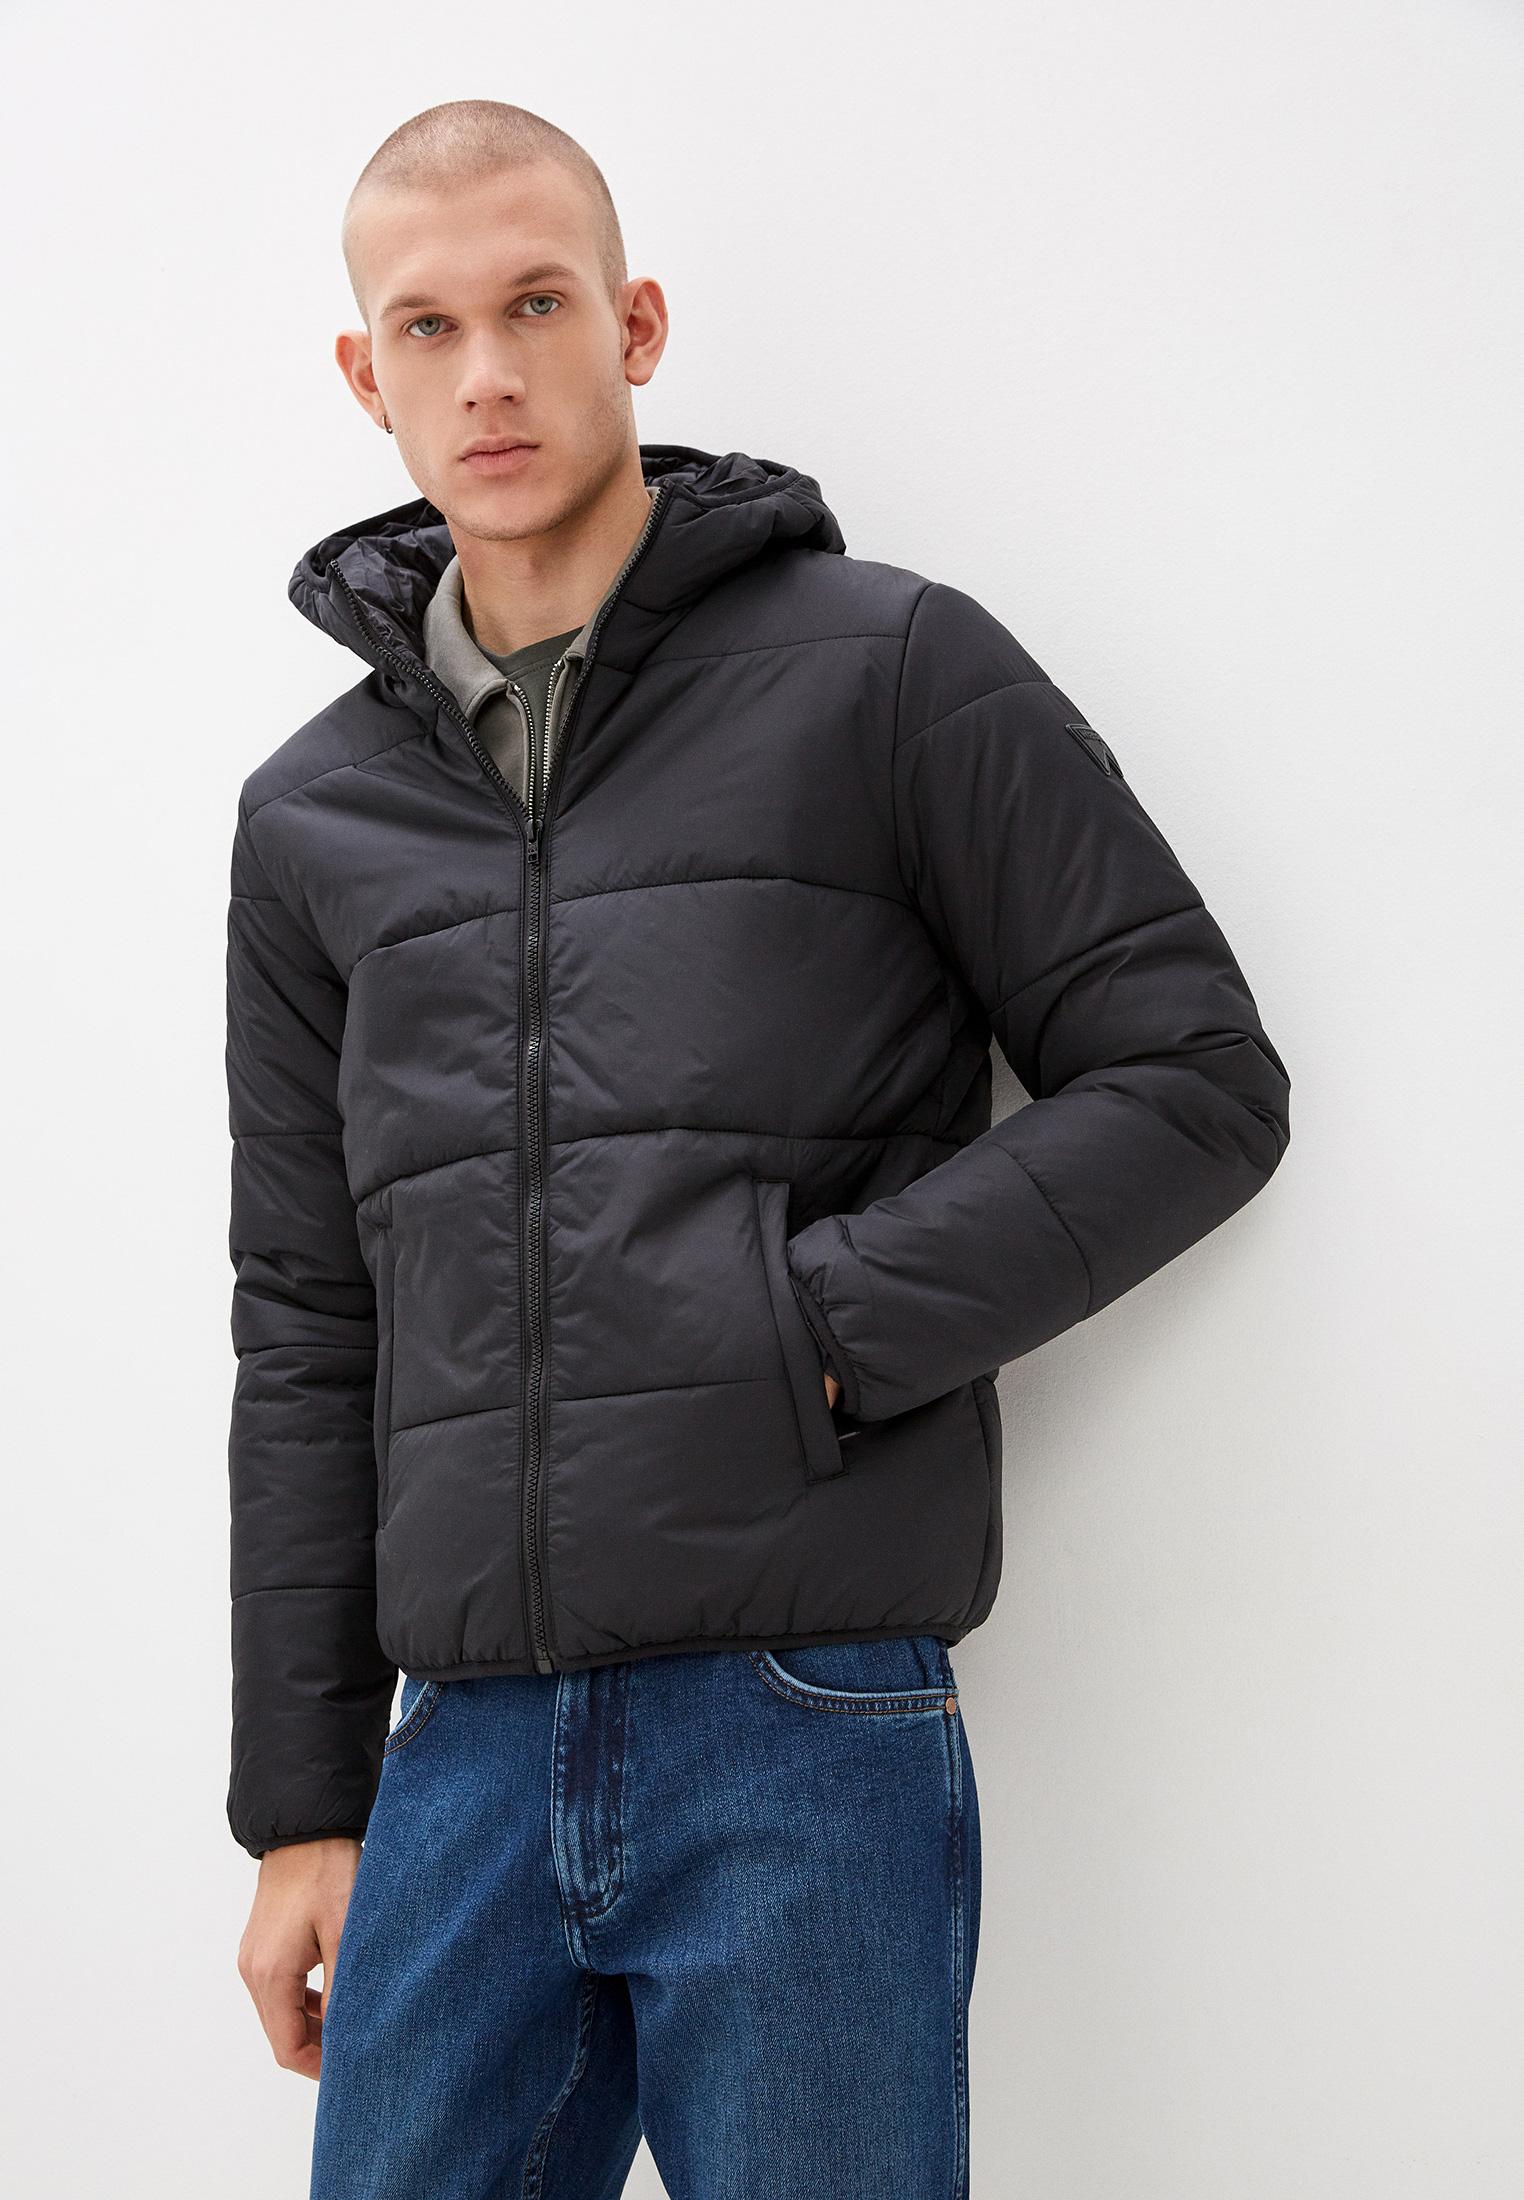 Утепленная куртка Wrangler (Вранглер) Куртка утепленная Wrangler